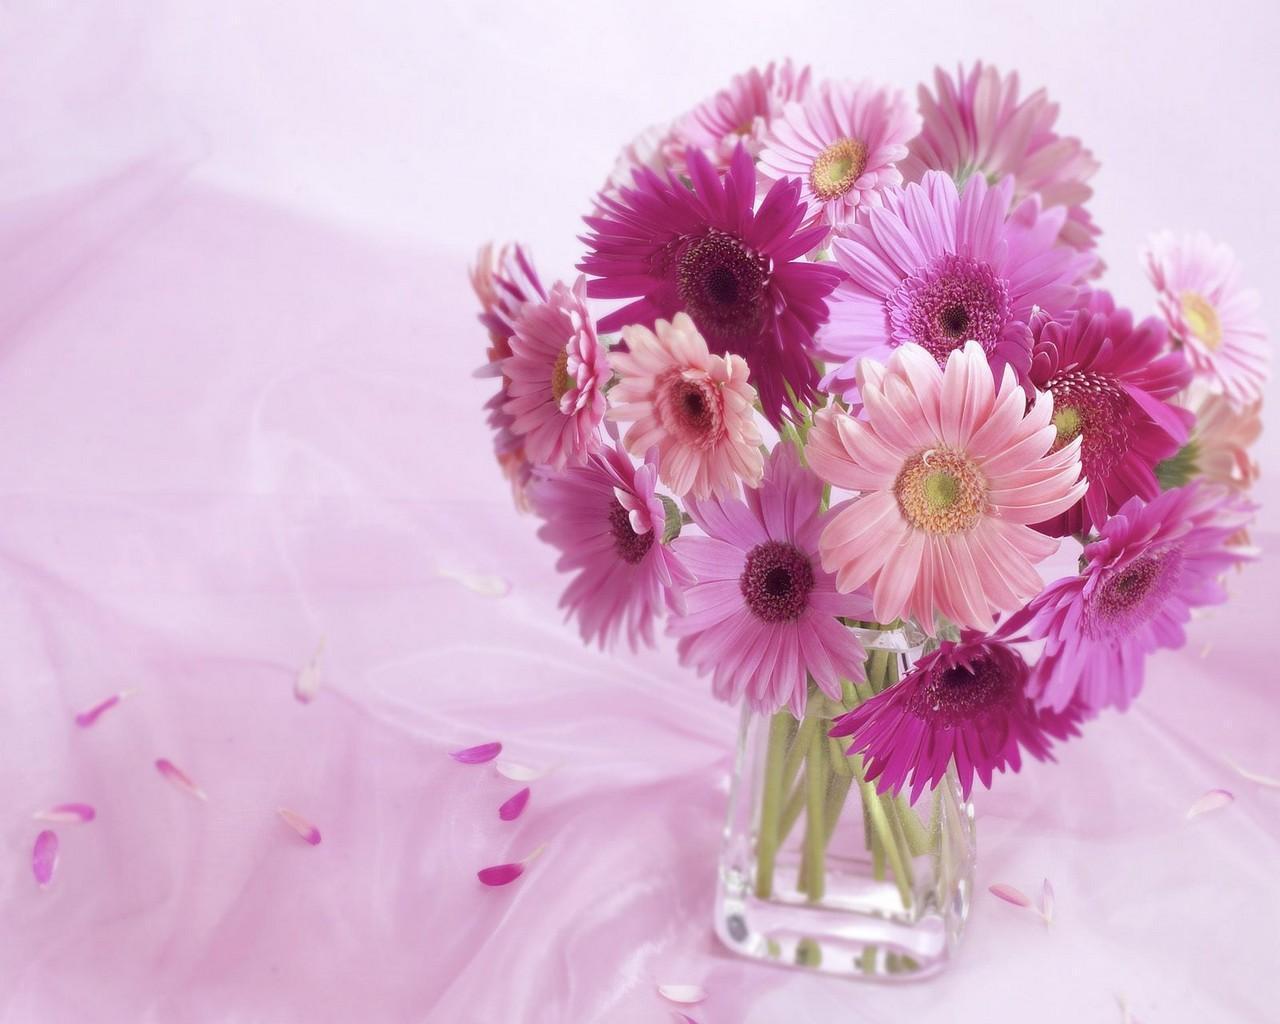 10021 descargar fondo de pantalla Plantas, Flores, Violeta: protectores de pantalla e imágenes gratis